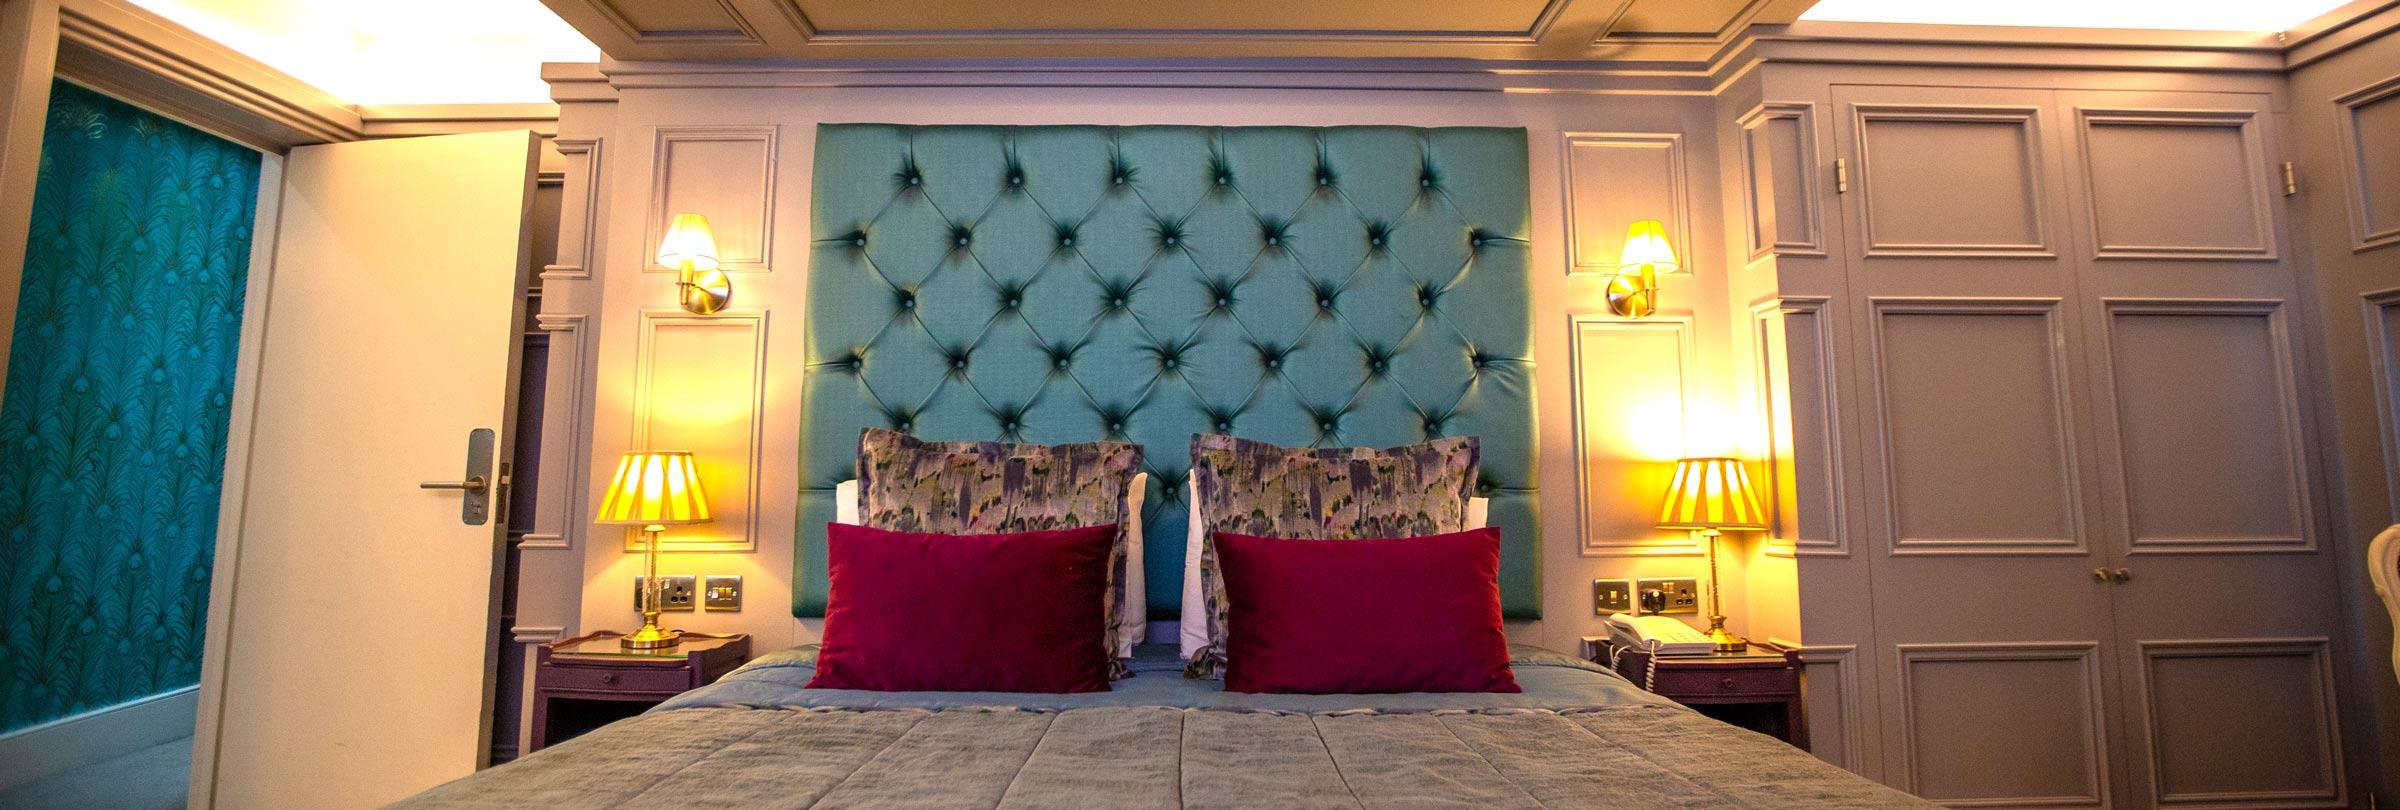 Wedding Hotel Accommodation 1